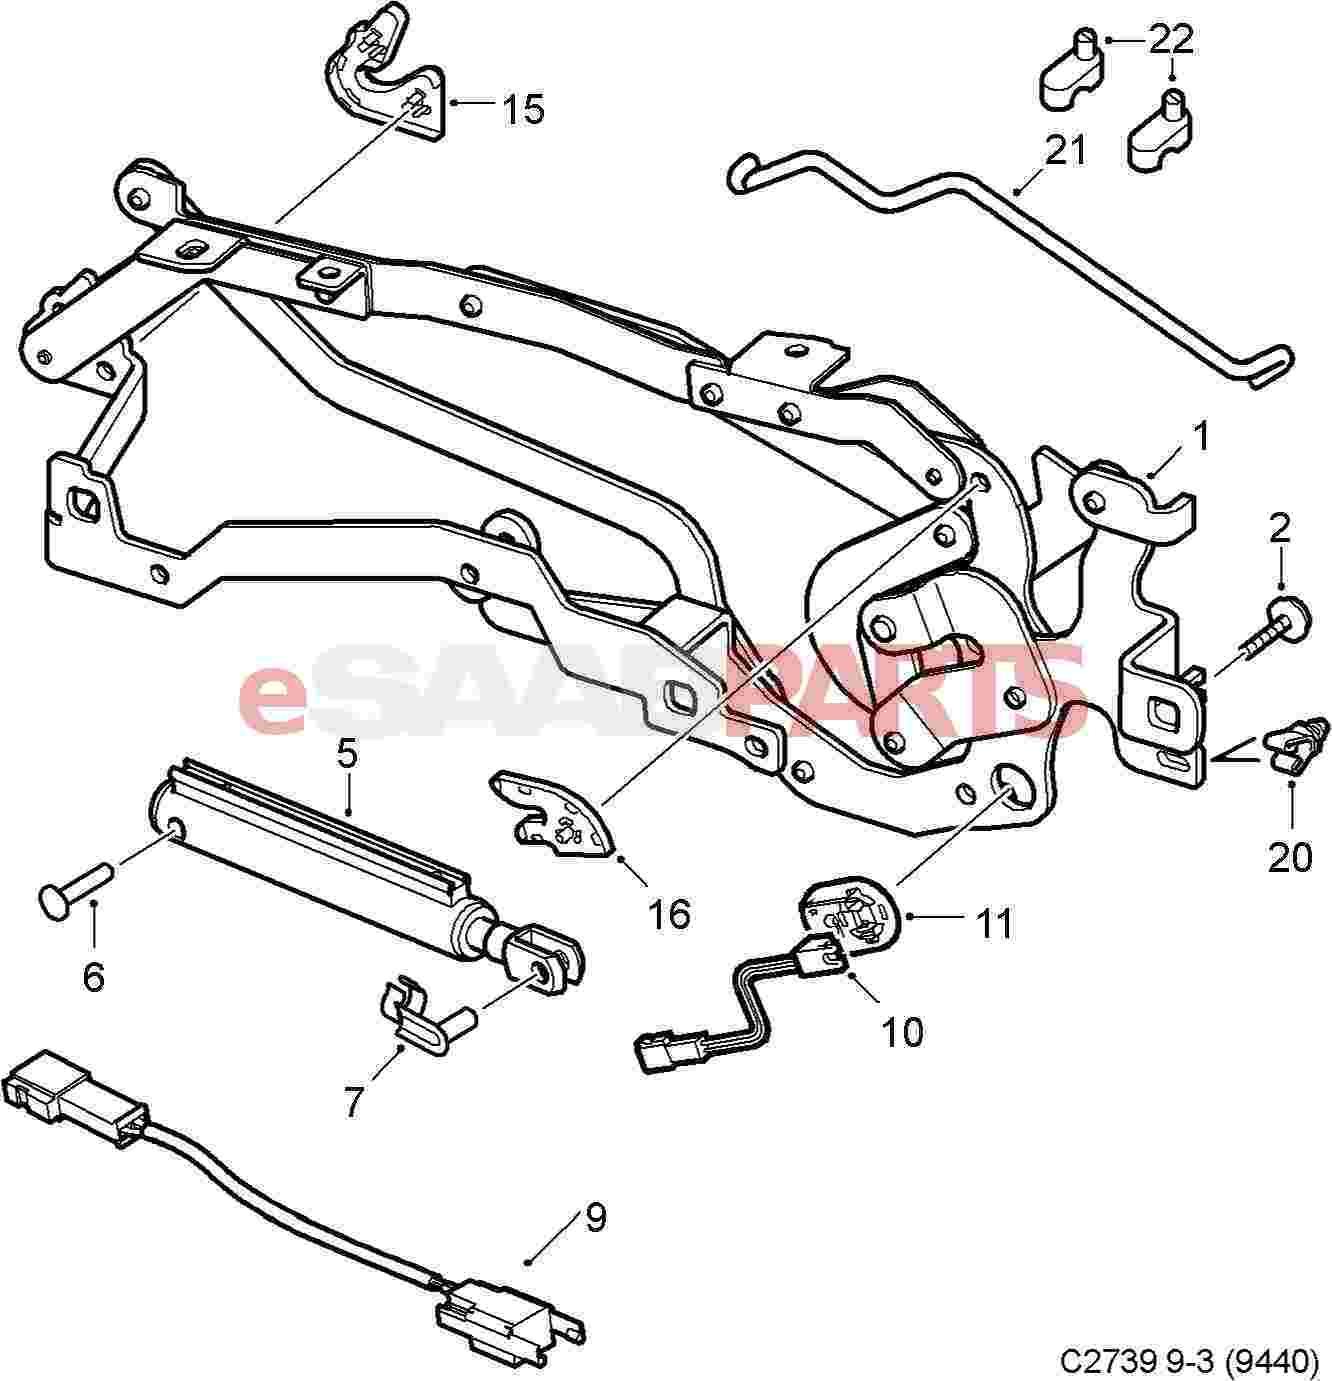 2006 saturn vue parts diagram 2009 ford ranger headlight wiring l200 brakes best free